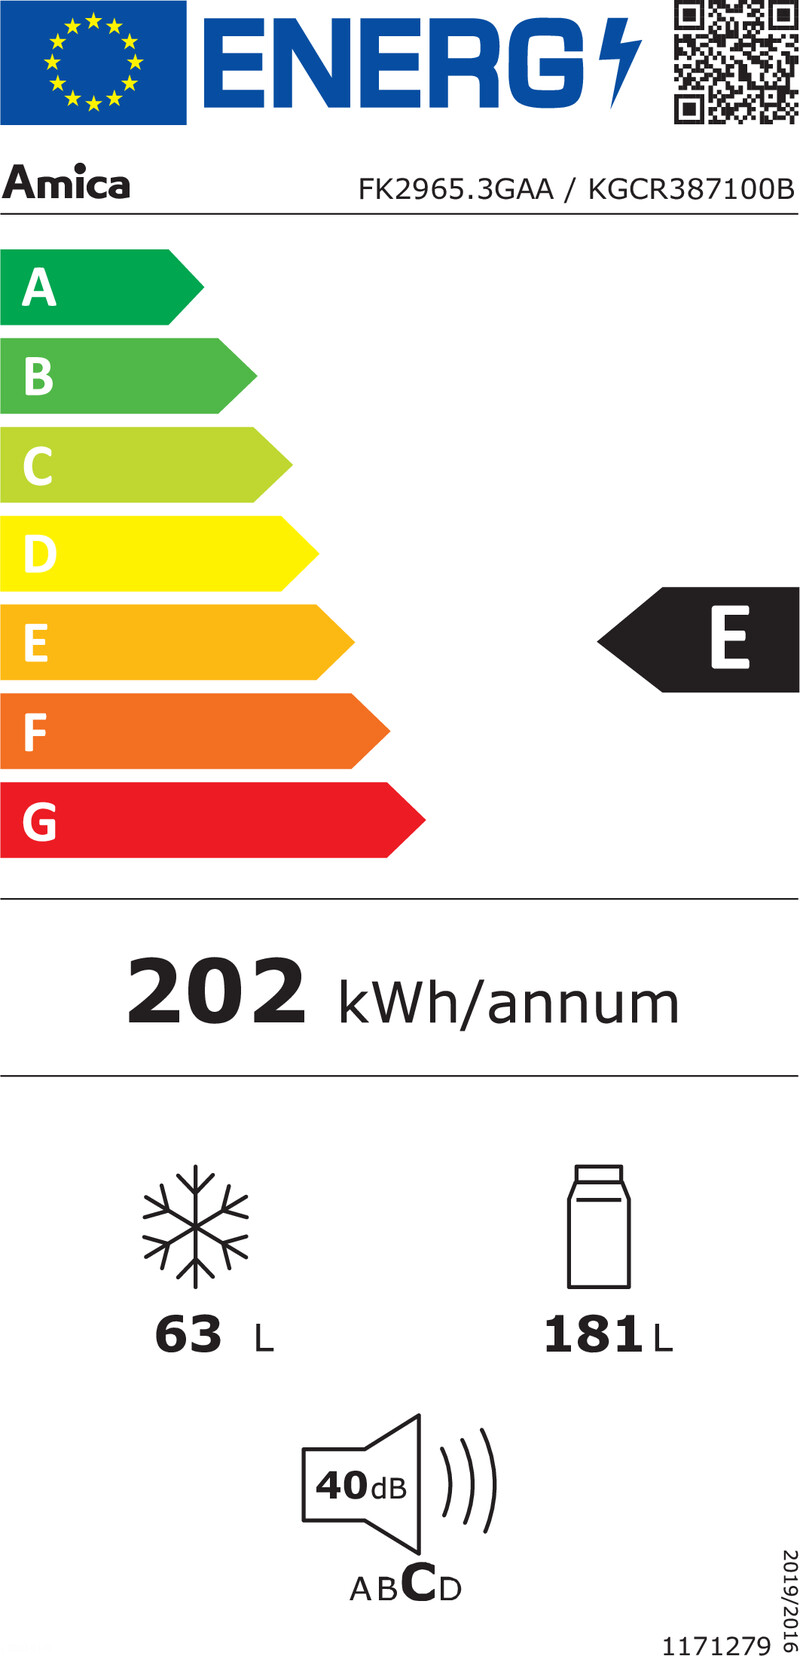 Energetický štítek Amica KGCR 387100B